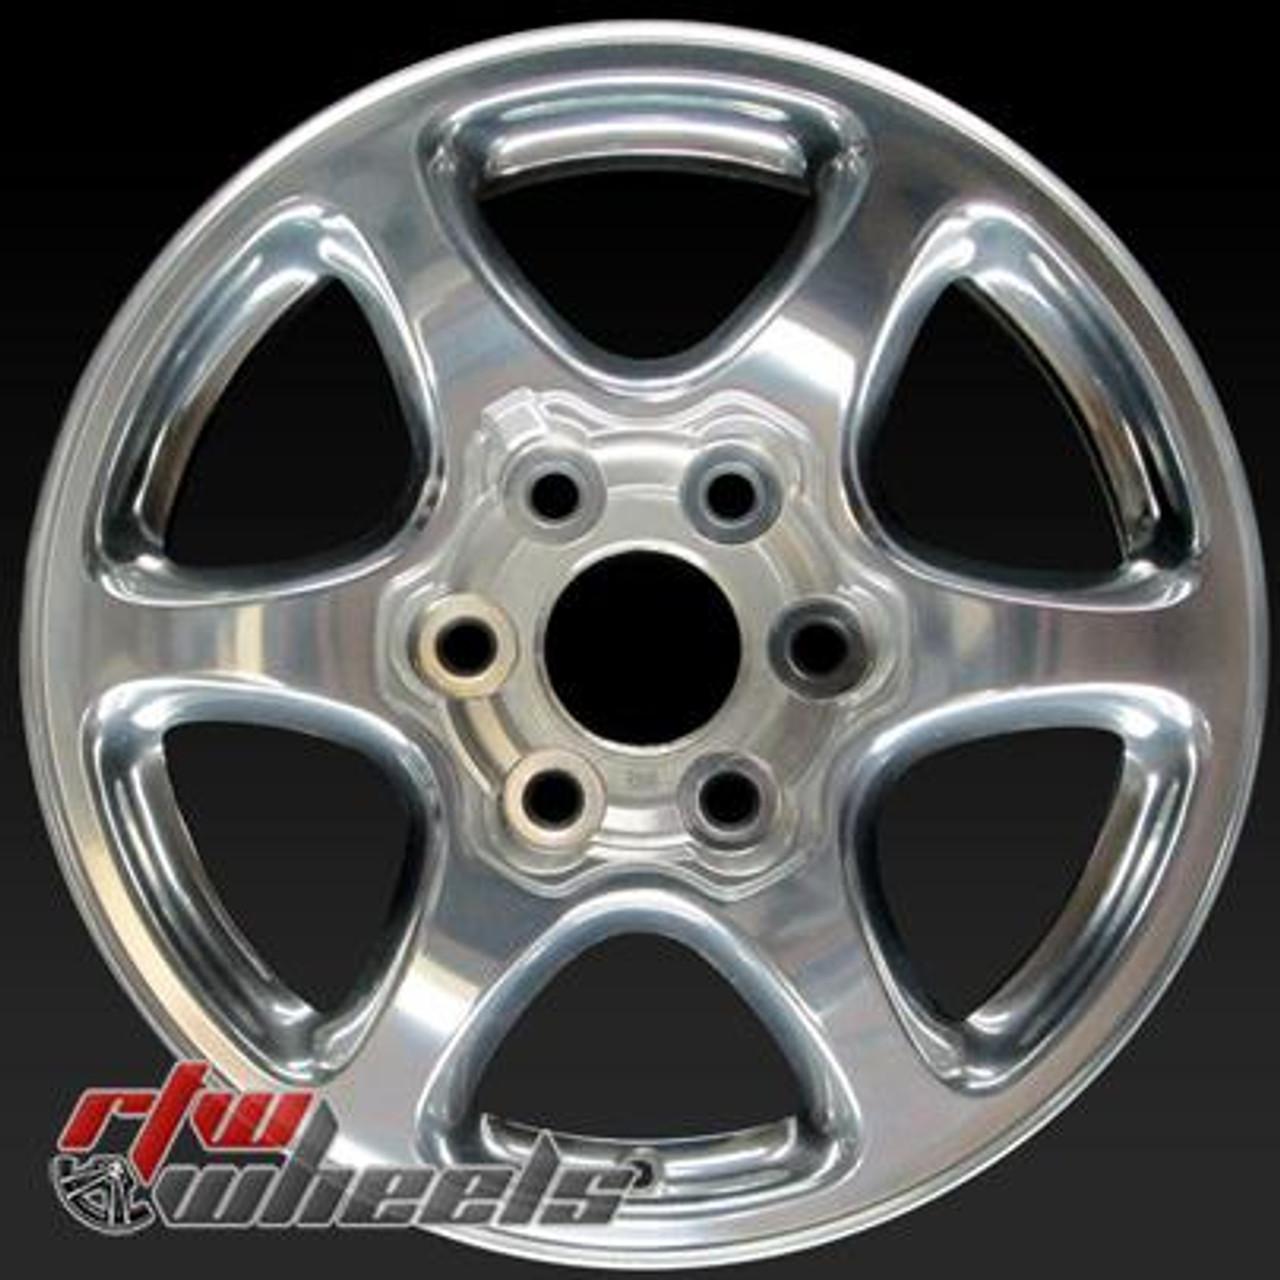 17 Gmc Yukon Oem Wheels For Sale 2002 2007 Polished Rims 5132